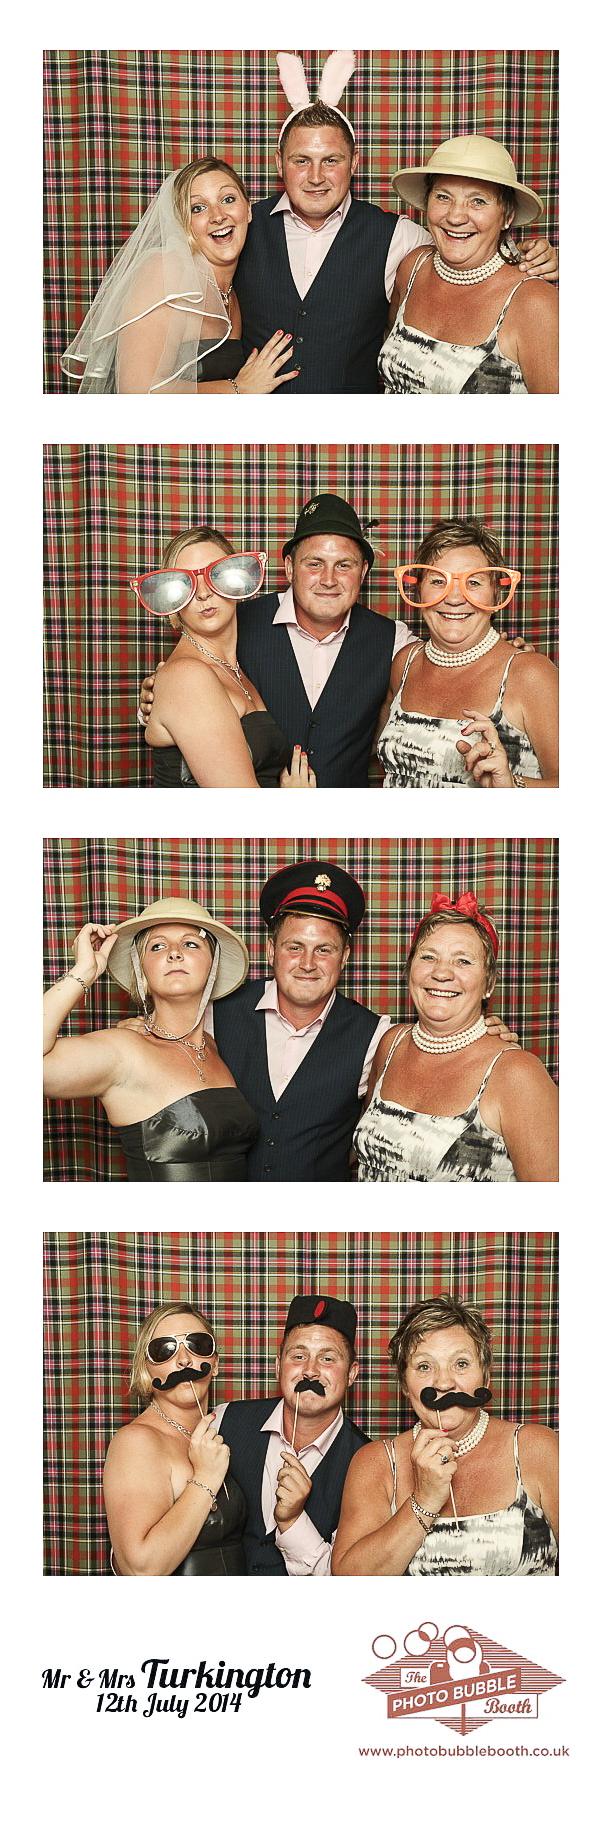 Mr & Mrs Turkington Photobooth _18.JPG